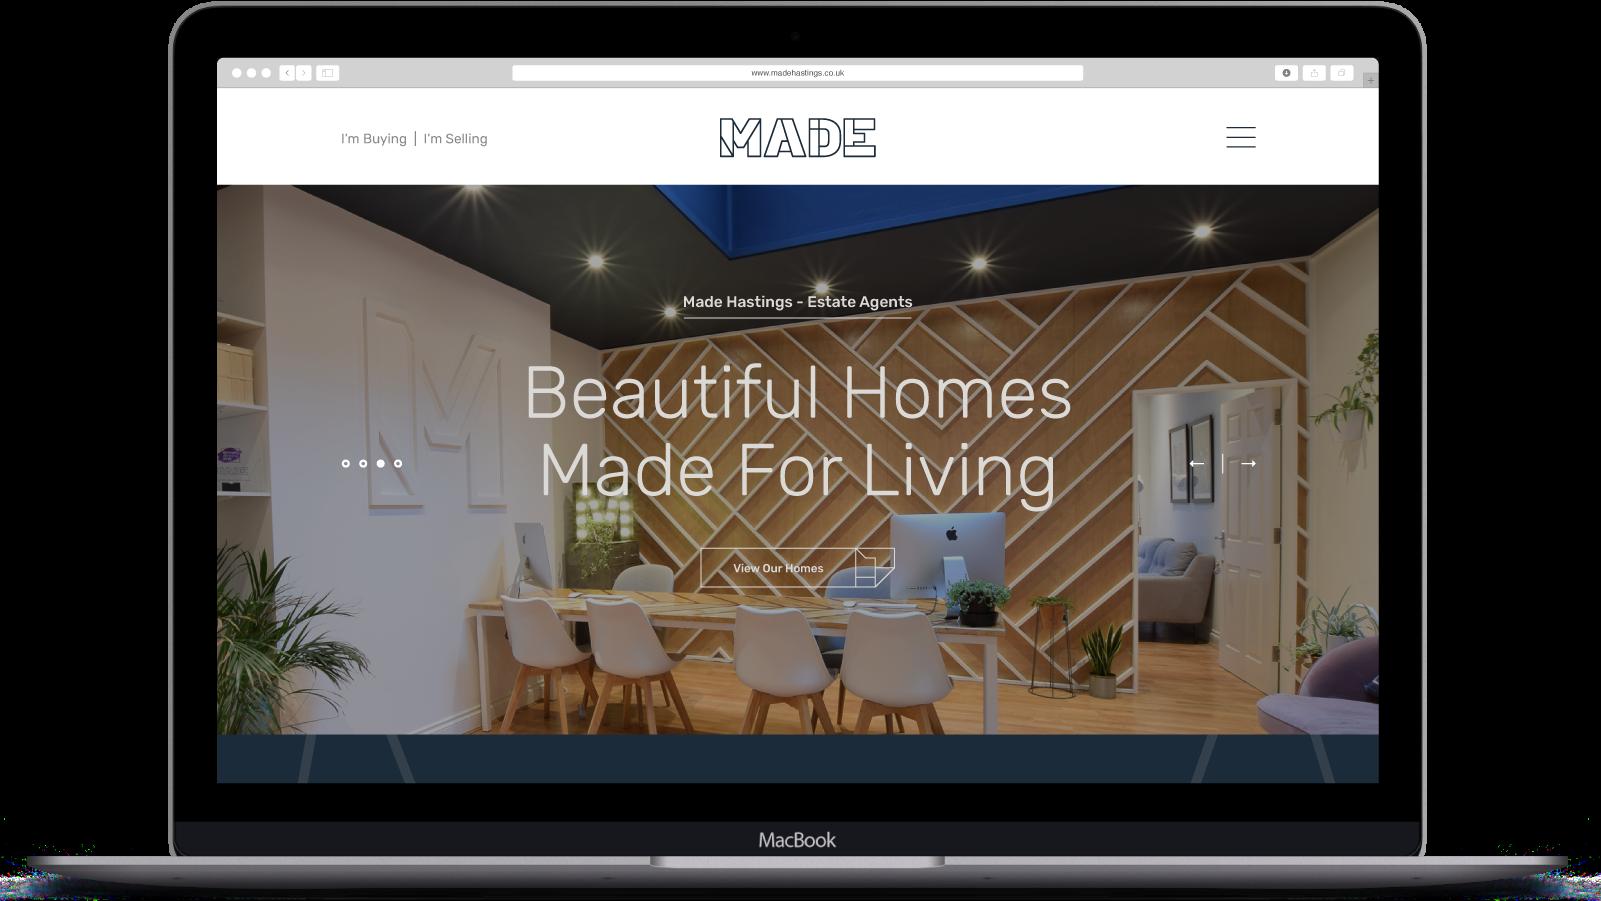 Made Hastings estate agency branding applied to the desktop website.